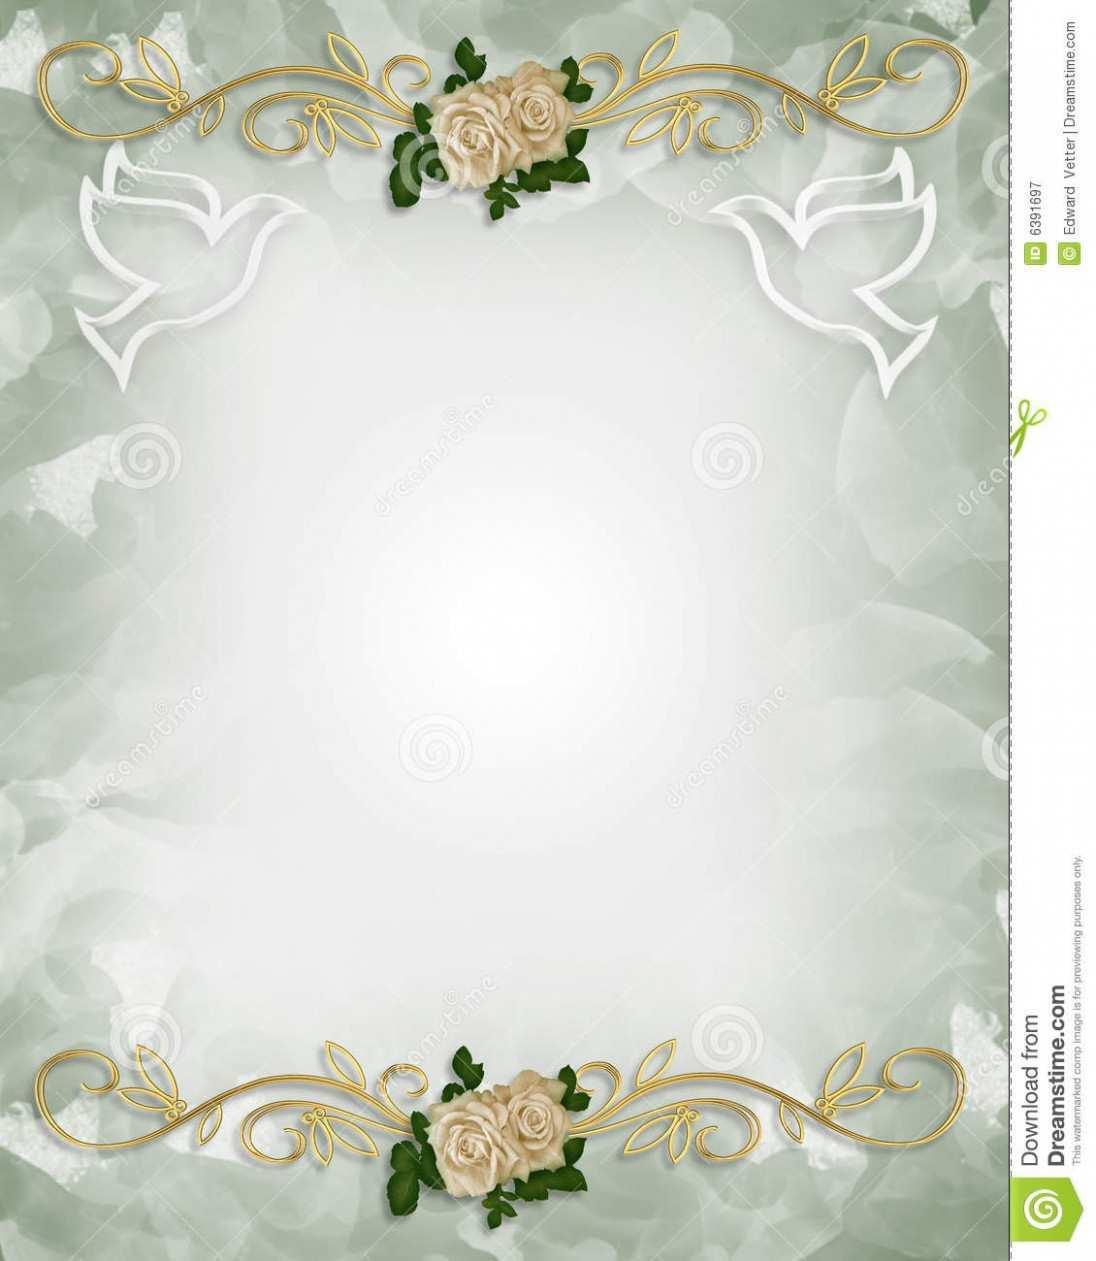 22 Standard Blank Wedding Invitation Card Template Templates with Blank Wedding Invitation Card Template